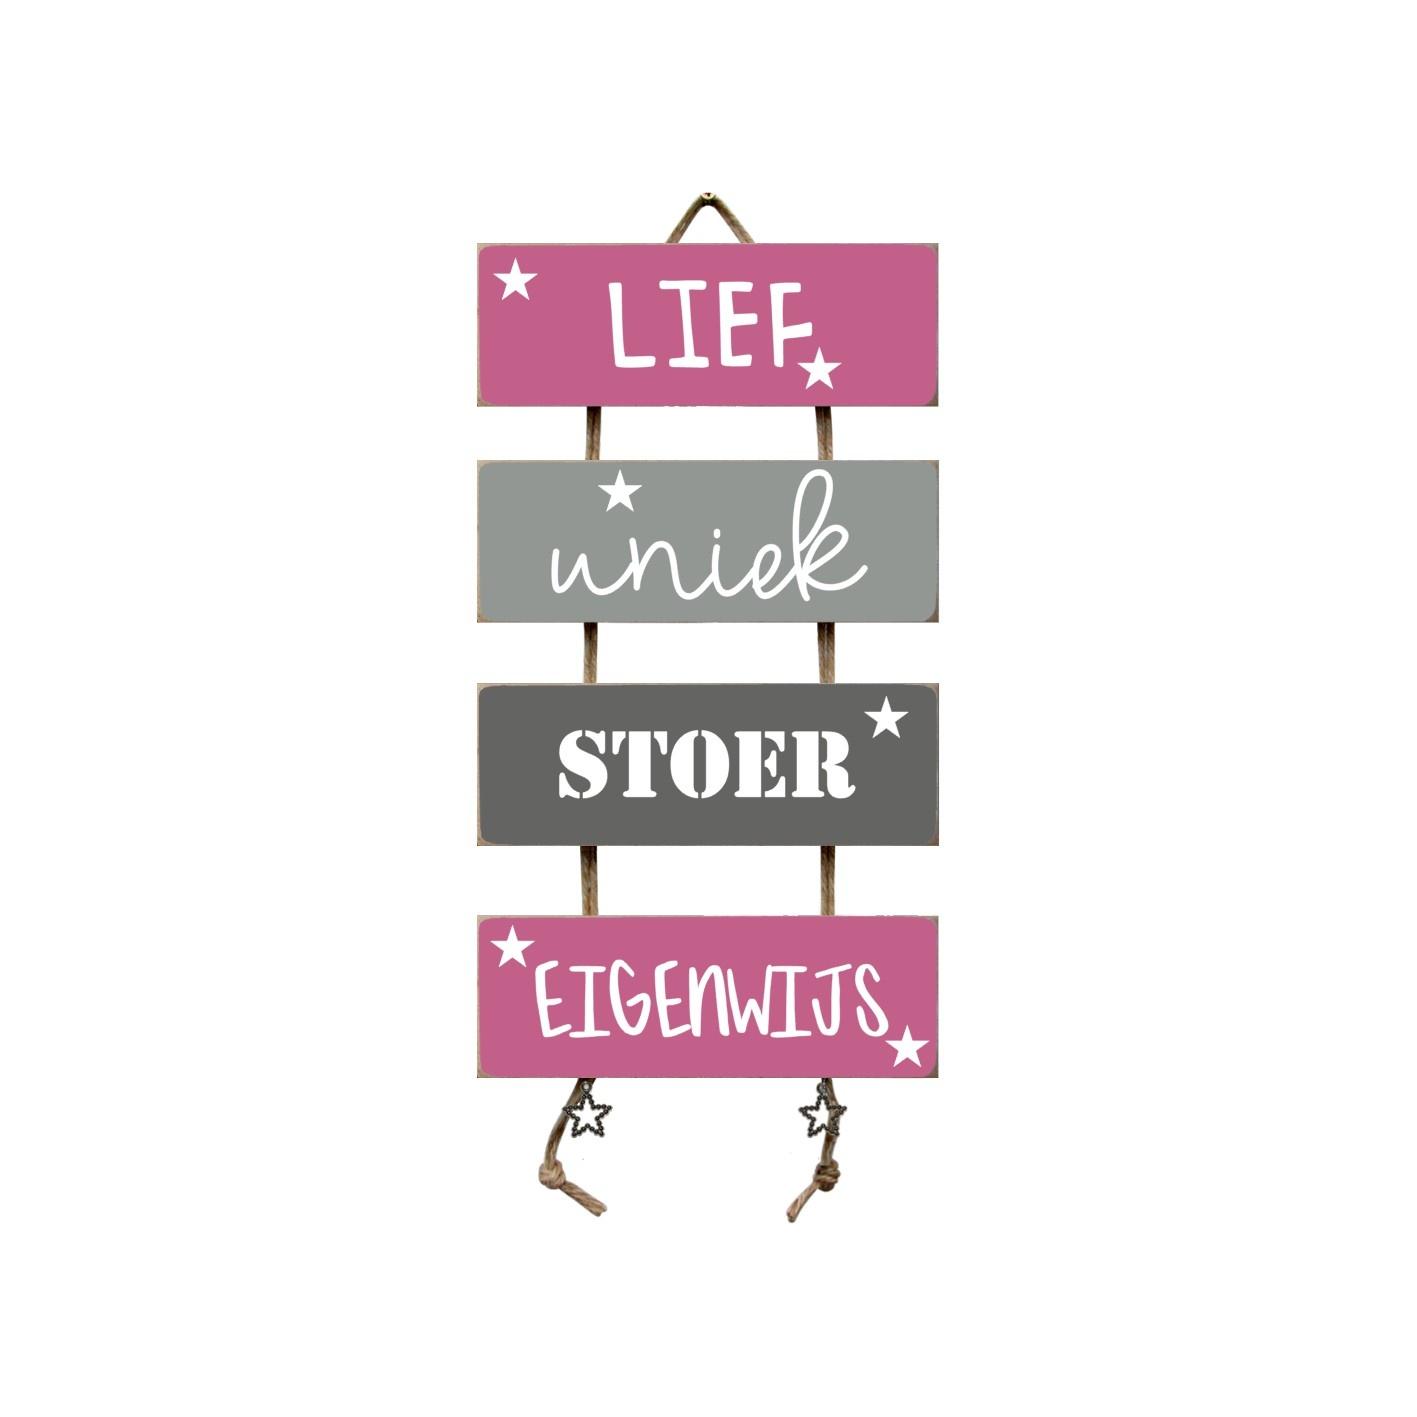 Tekstladder Roze/grijs Lief Uniek Stoer Eigenwijs